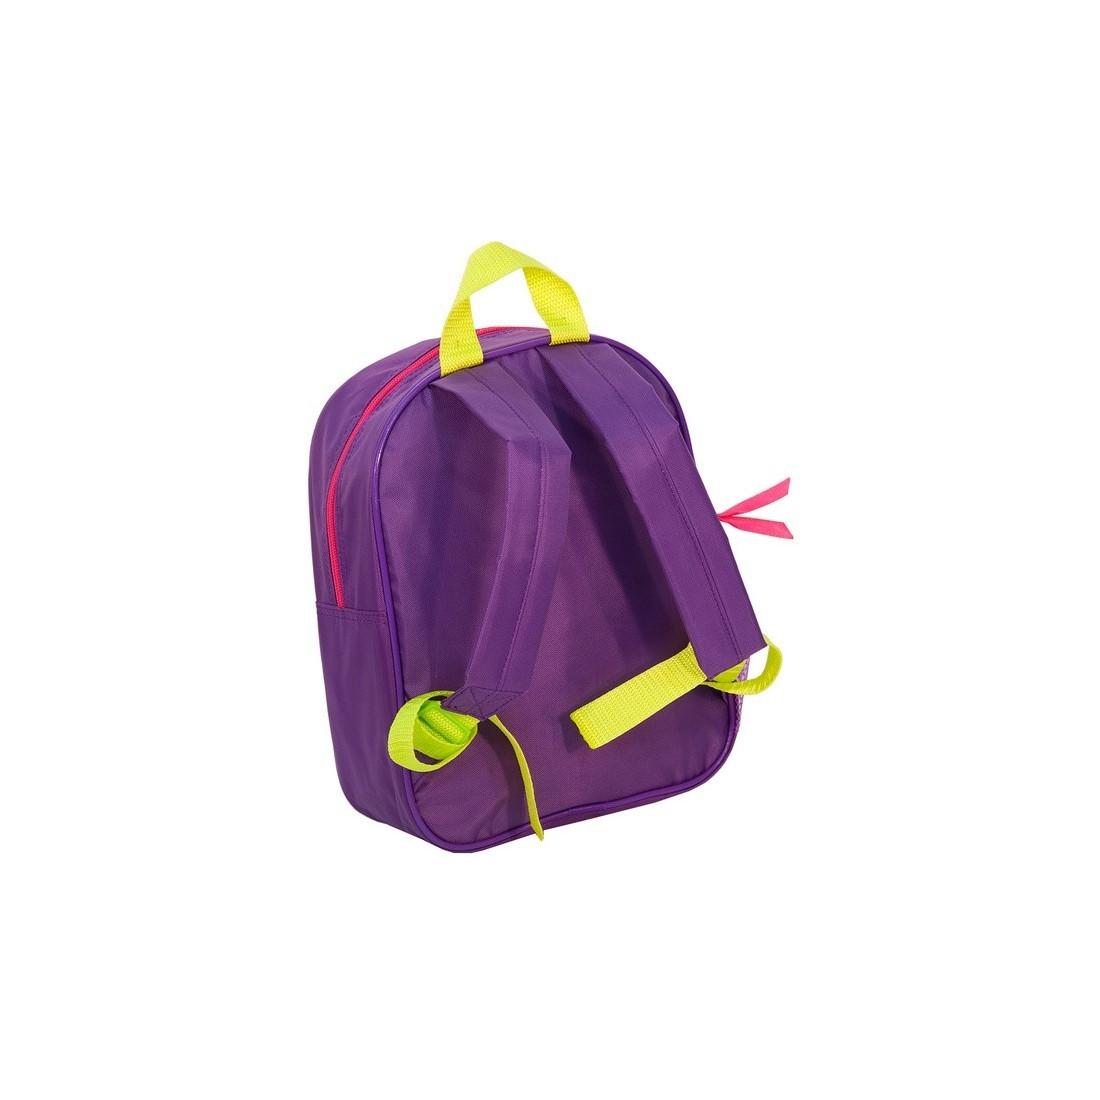 Plecaczek Violetta - plecak-tornister.pl